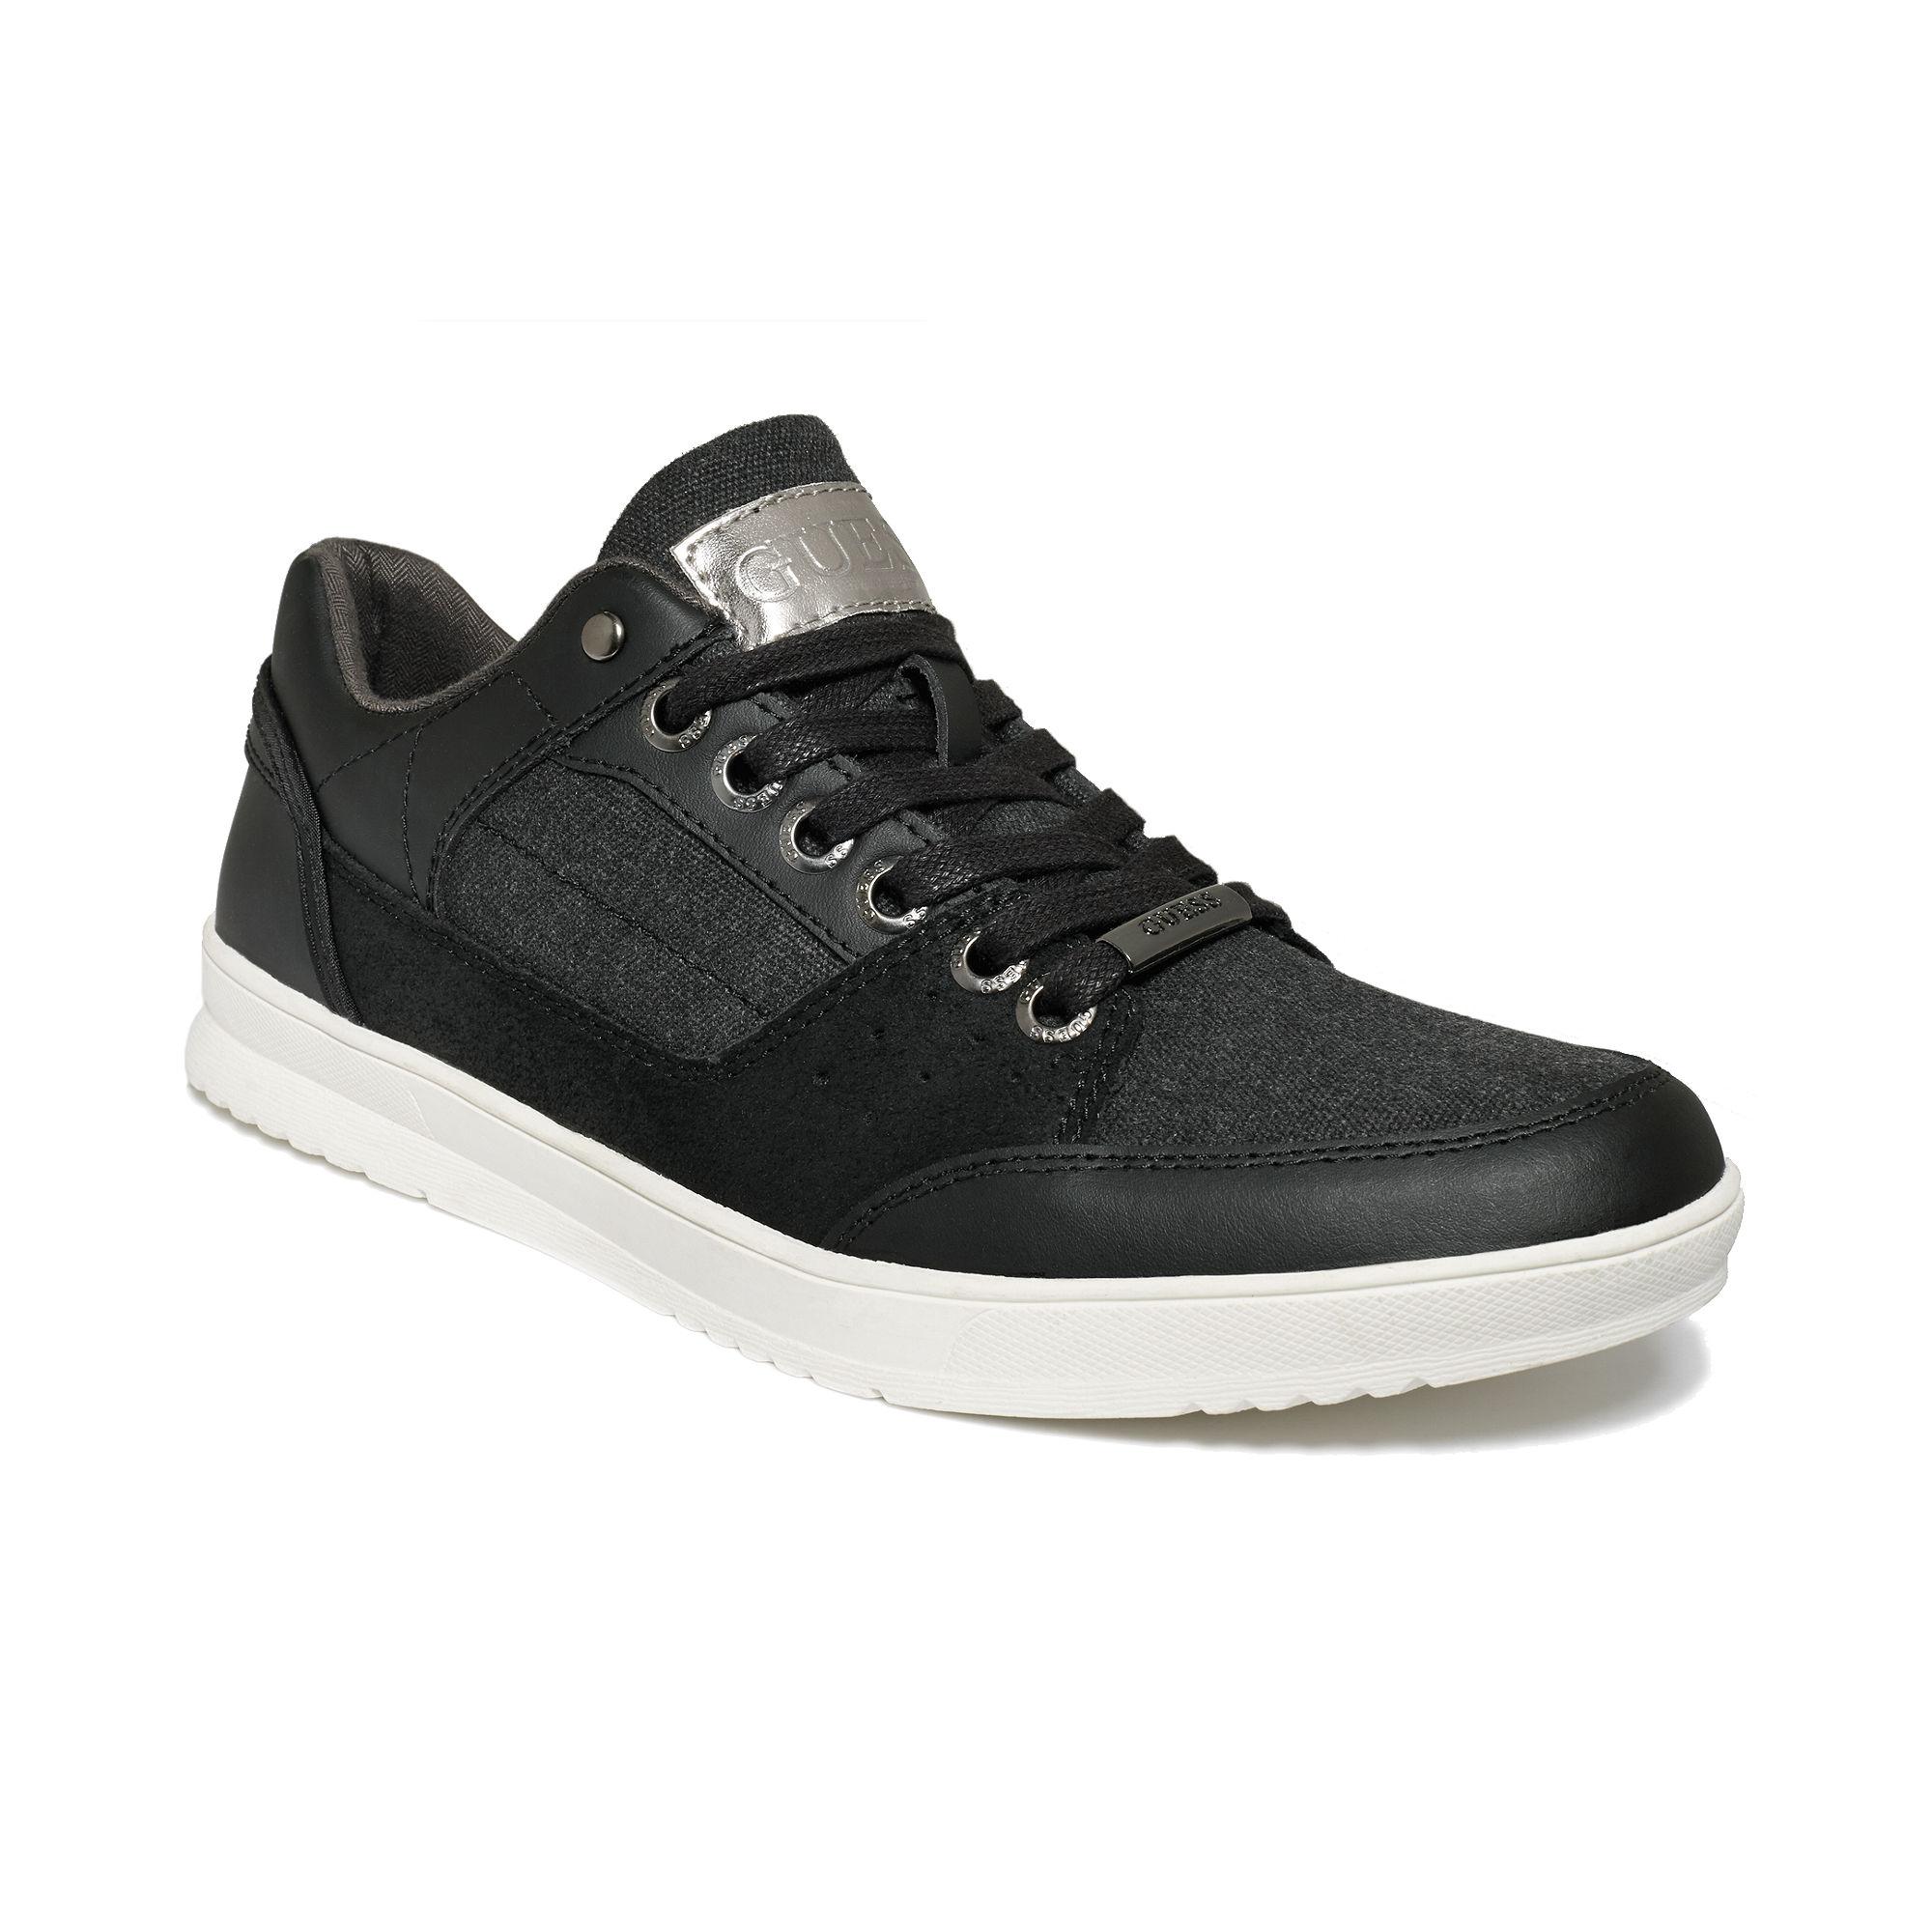 Mens Shoe Brands Macy